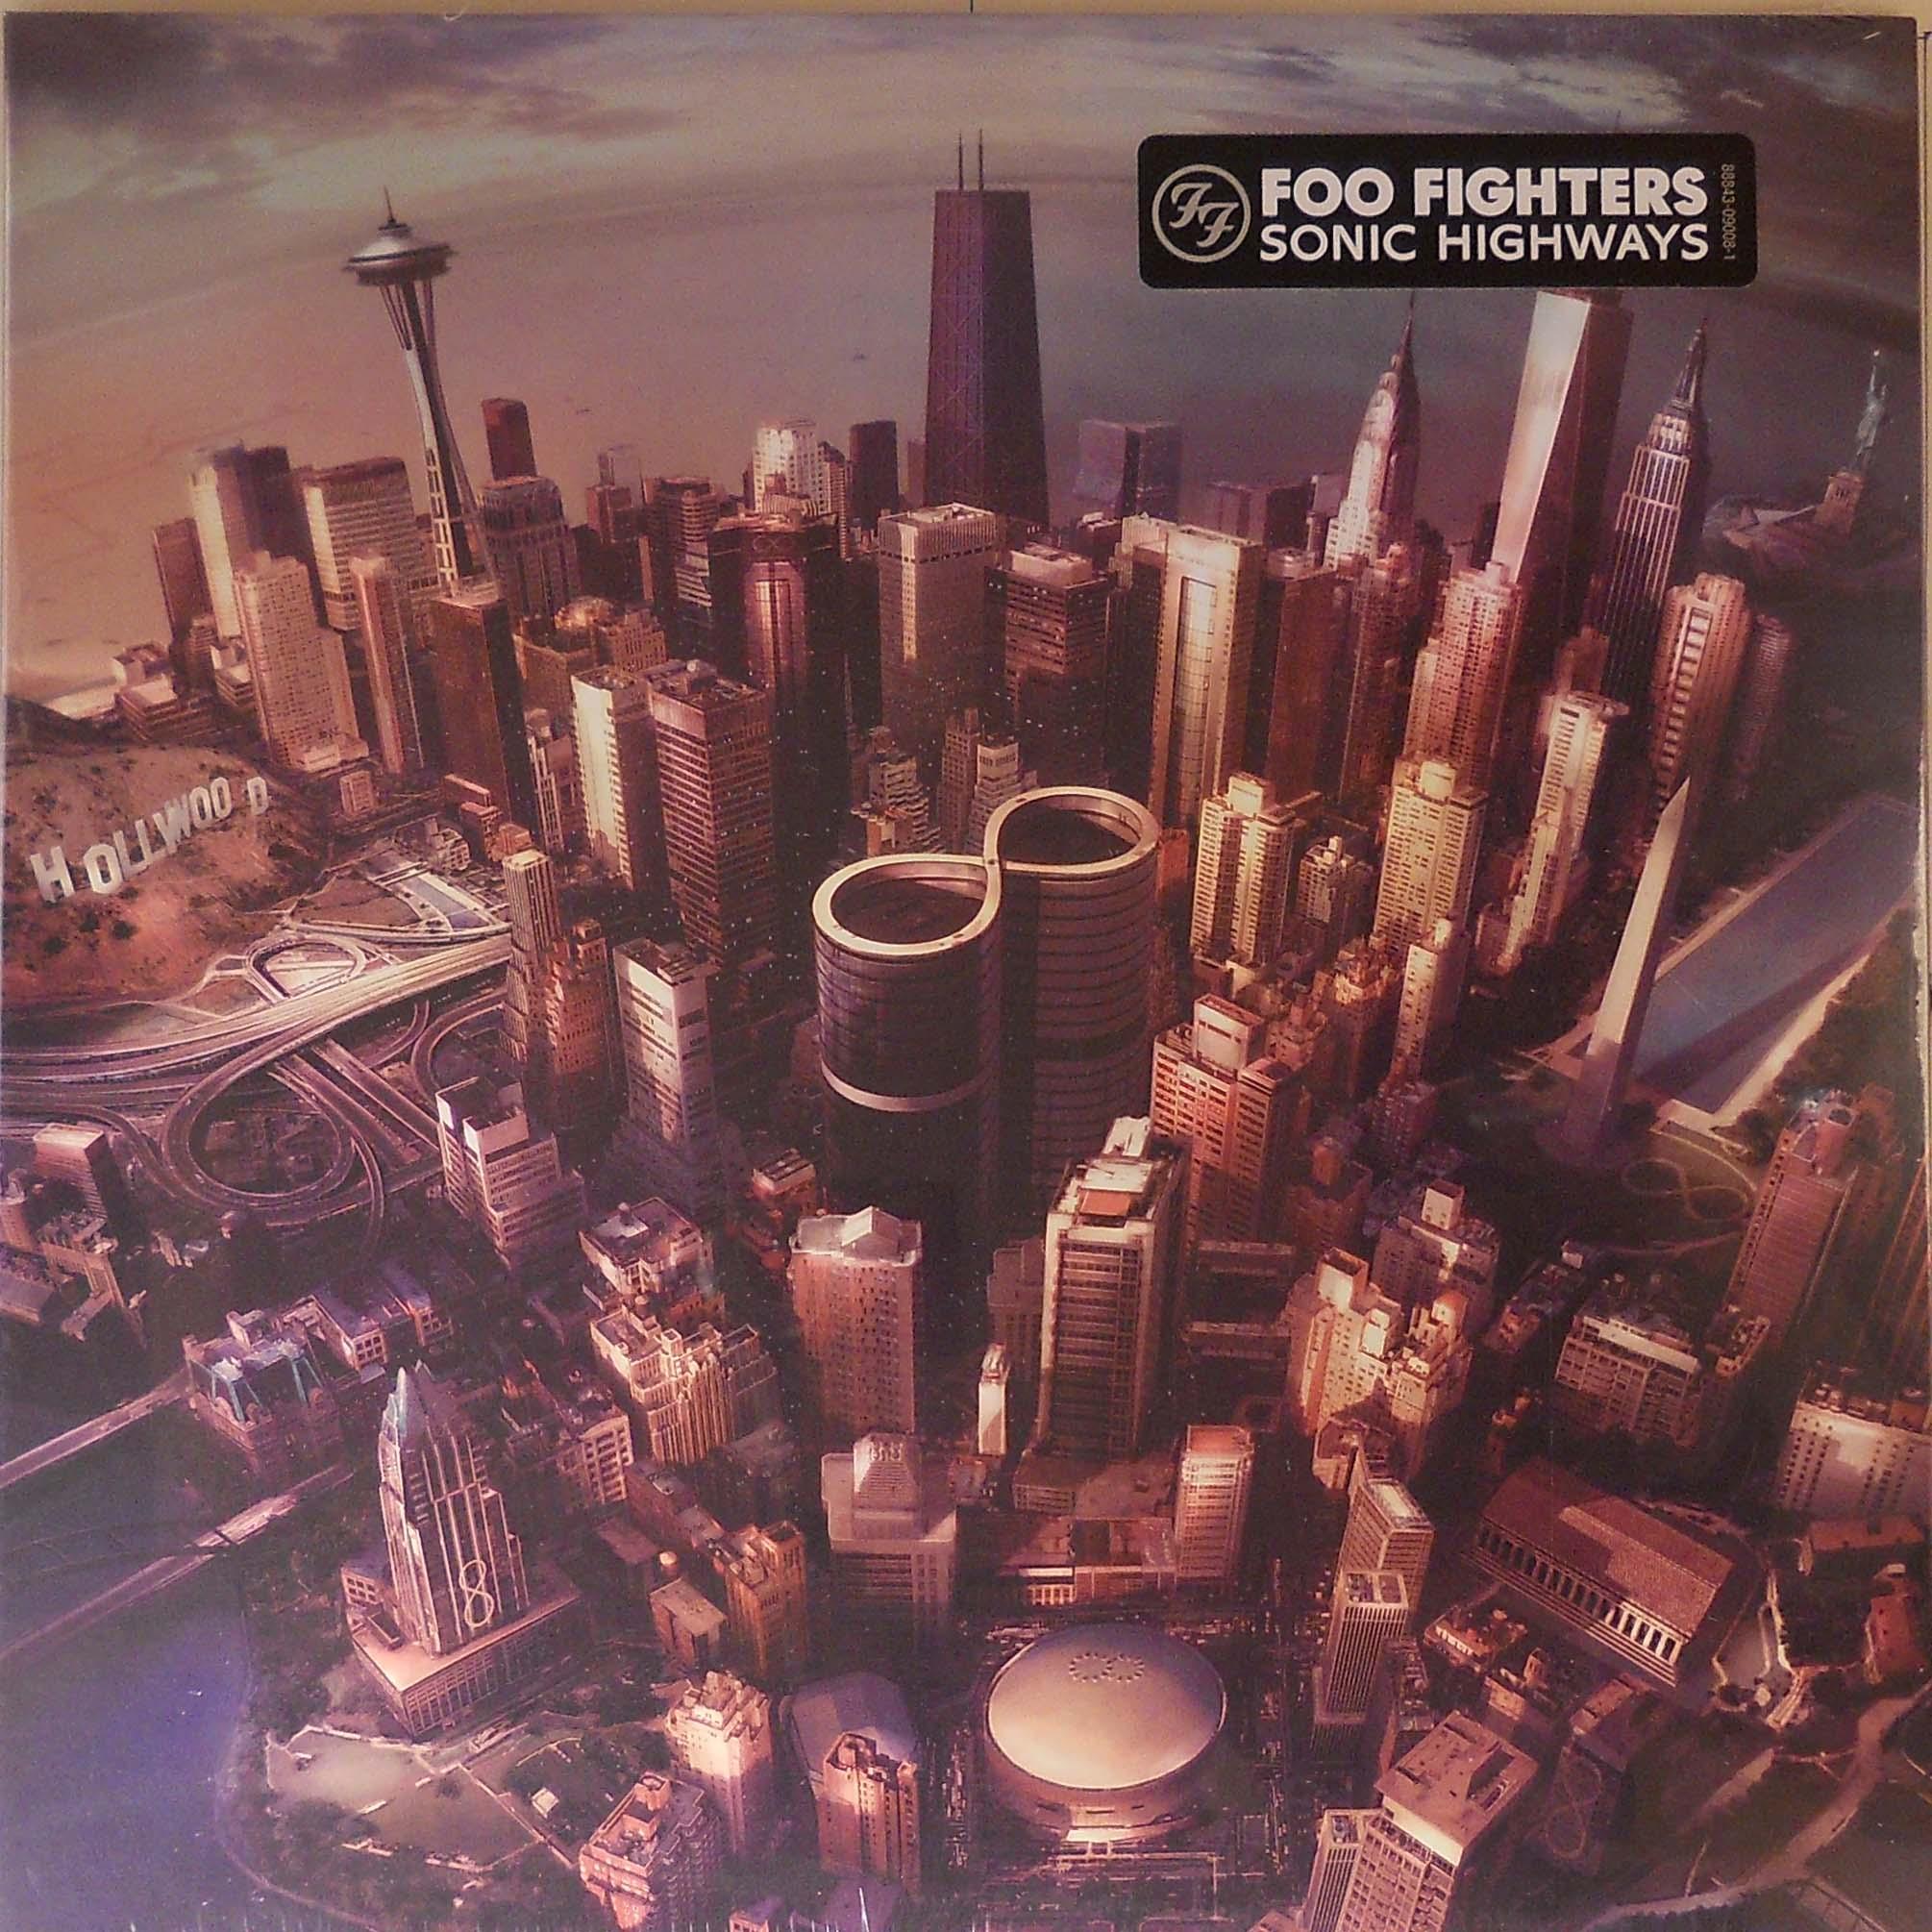 Foo Fighters - Sonic Highways Vinyl